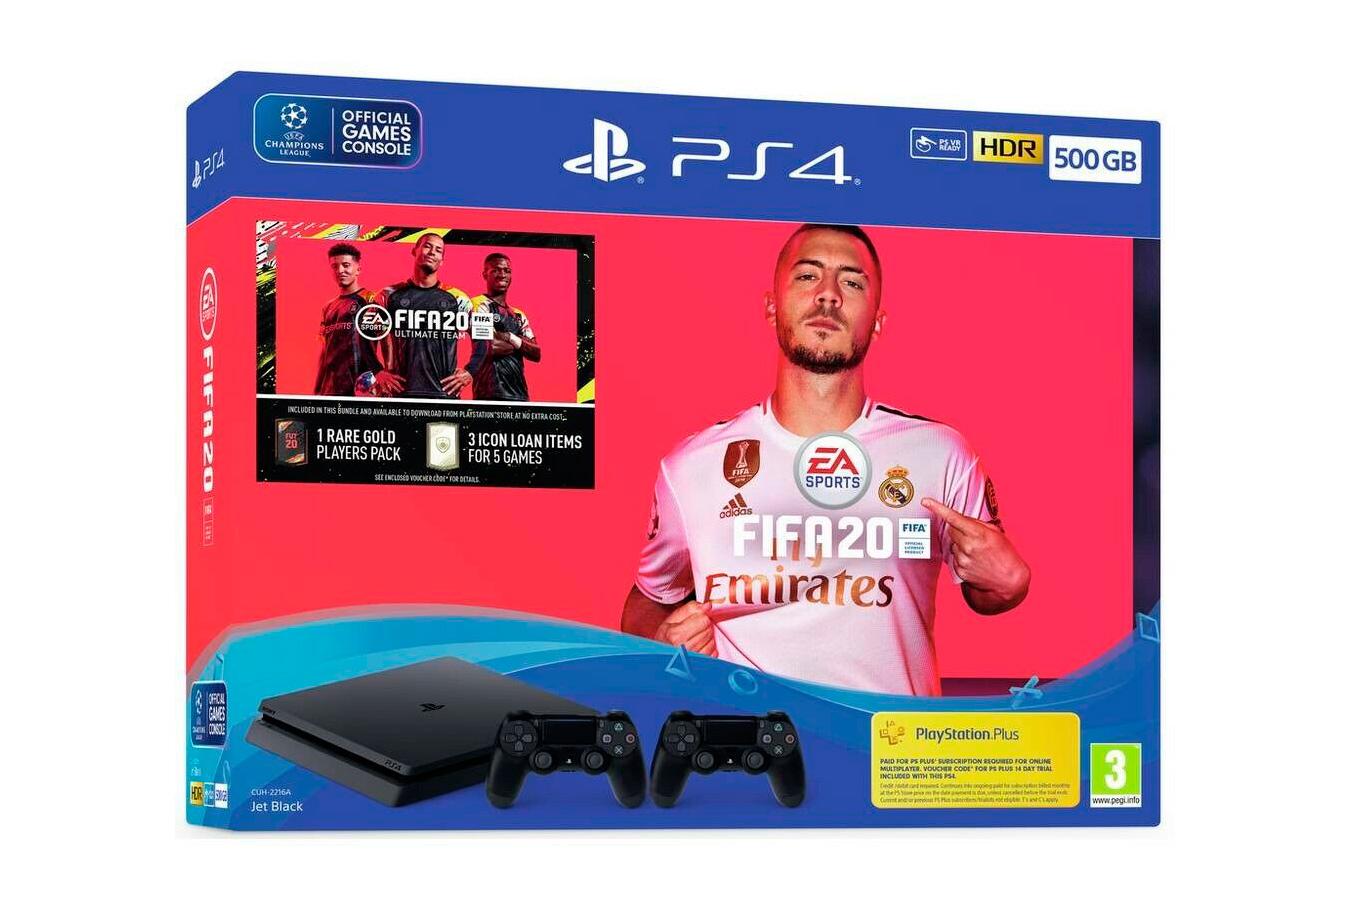 PlayStation 4 500Gb 2 джойстика, с игрой FIFA 20 [PS4S5J2F20]